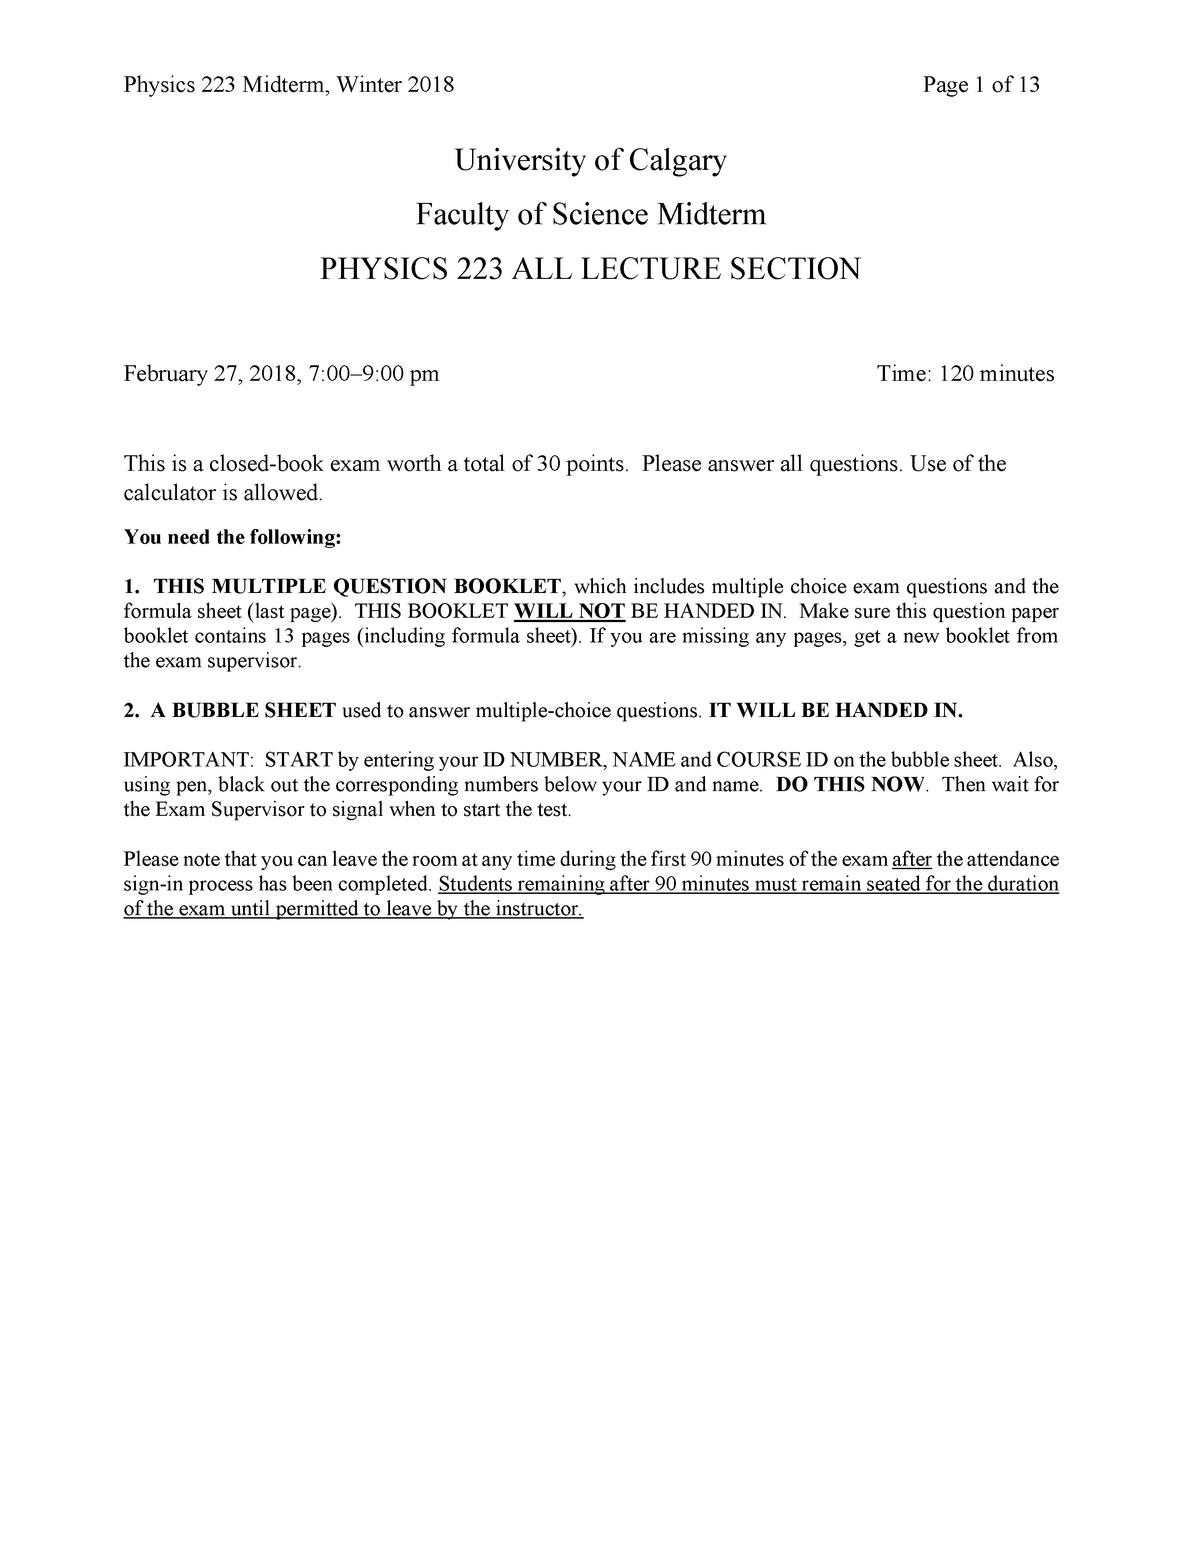 Book for physics formula